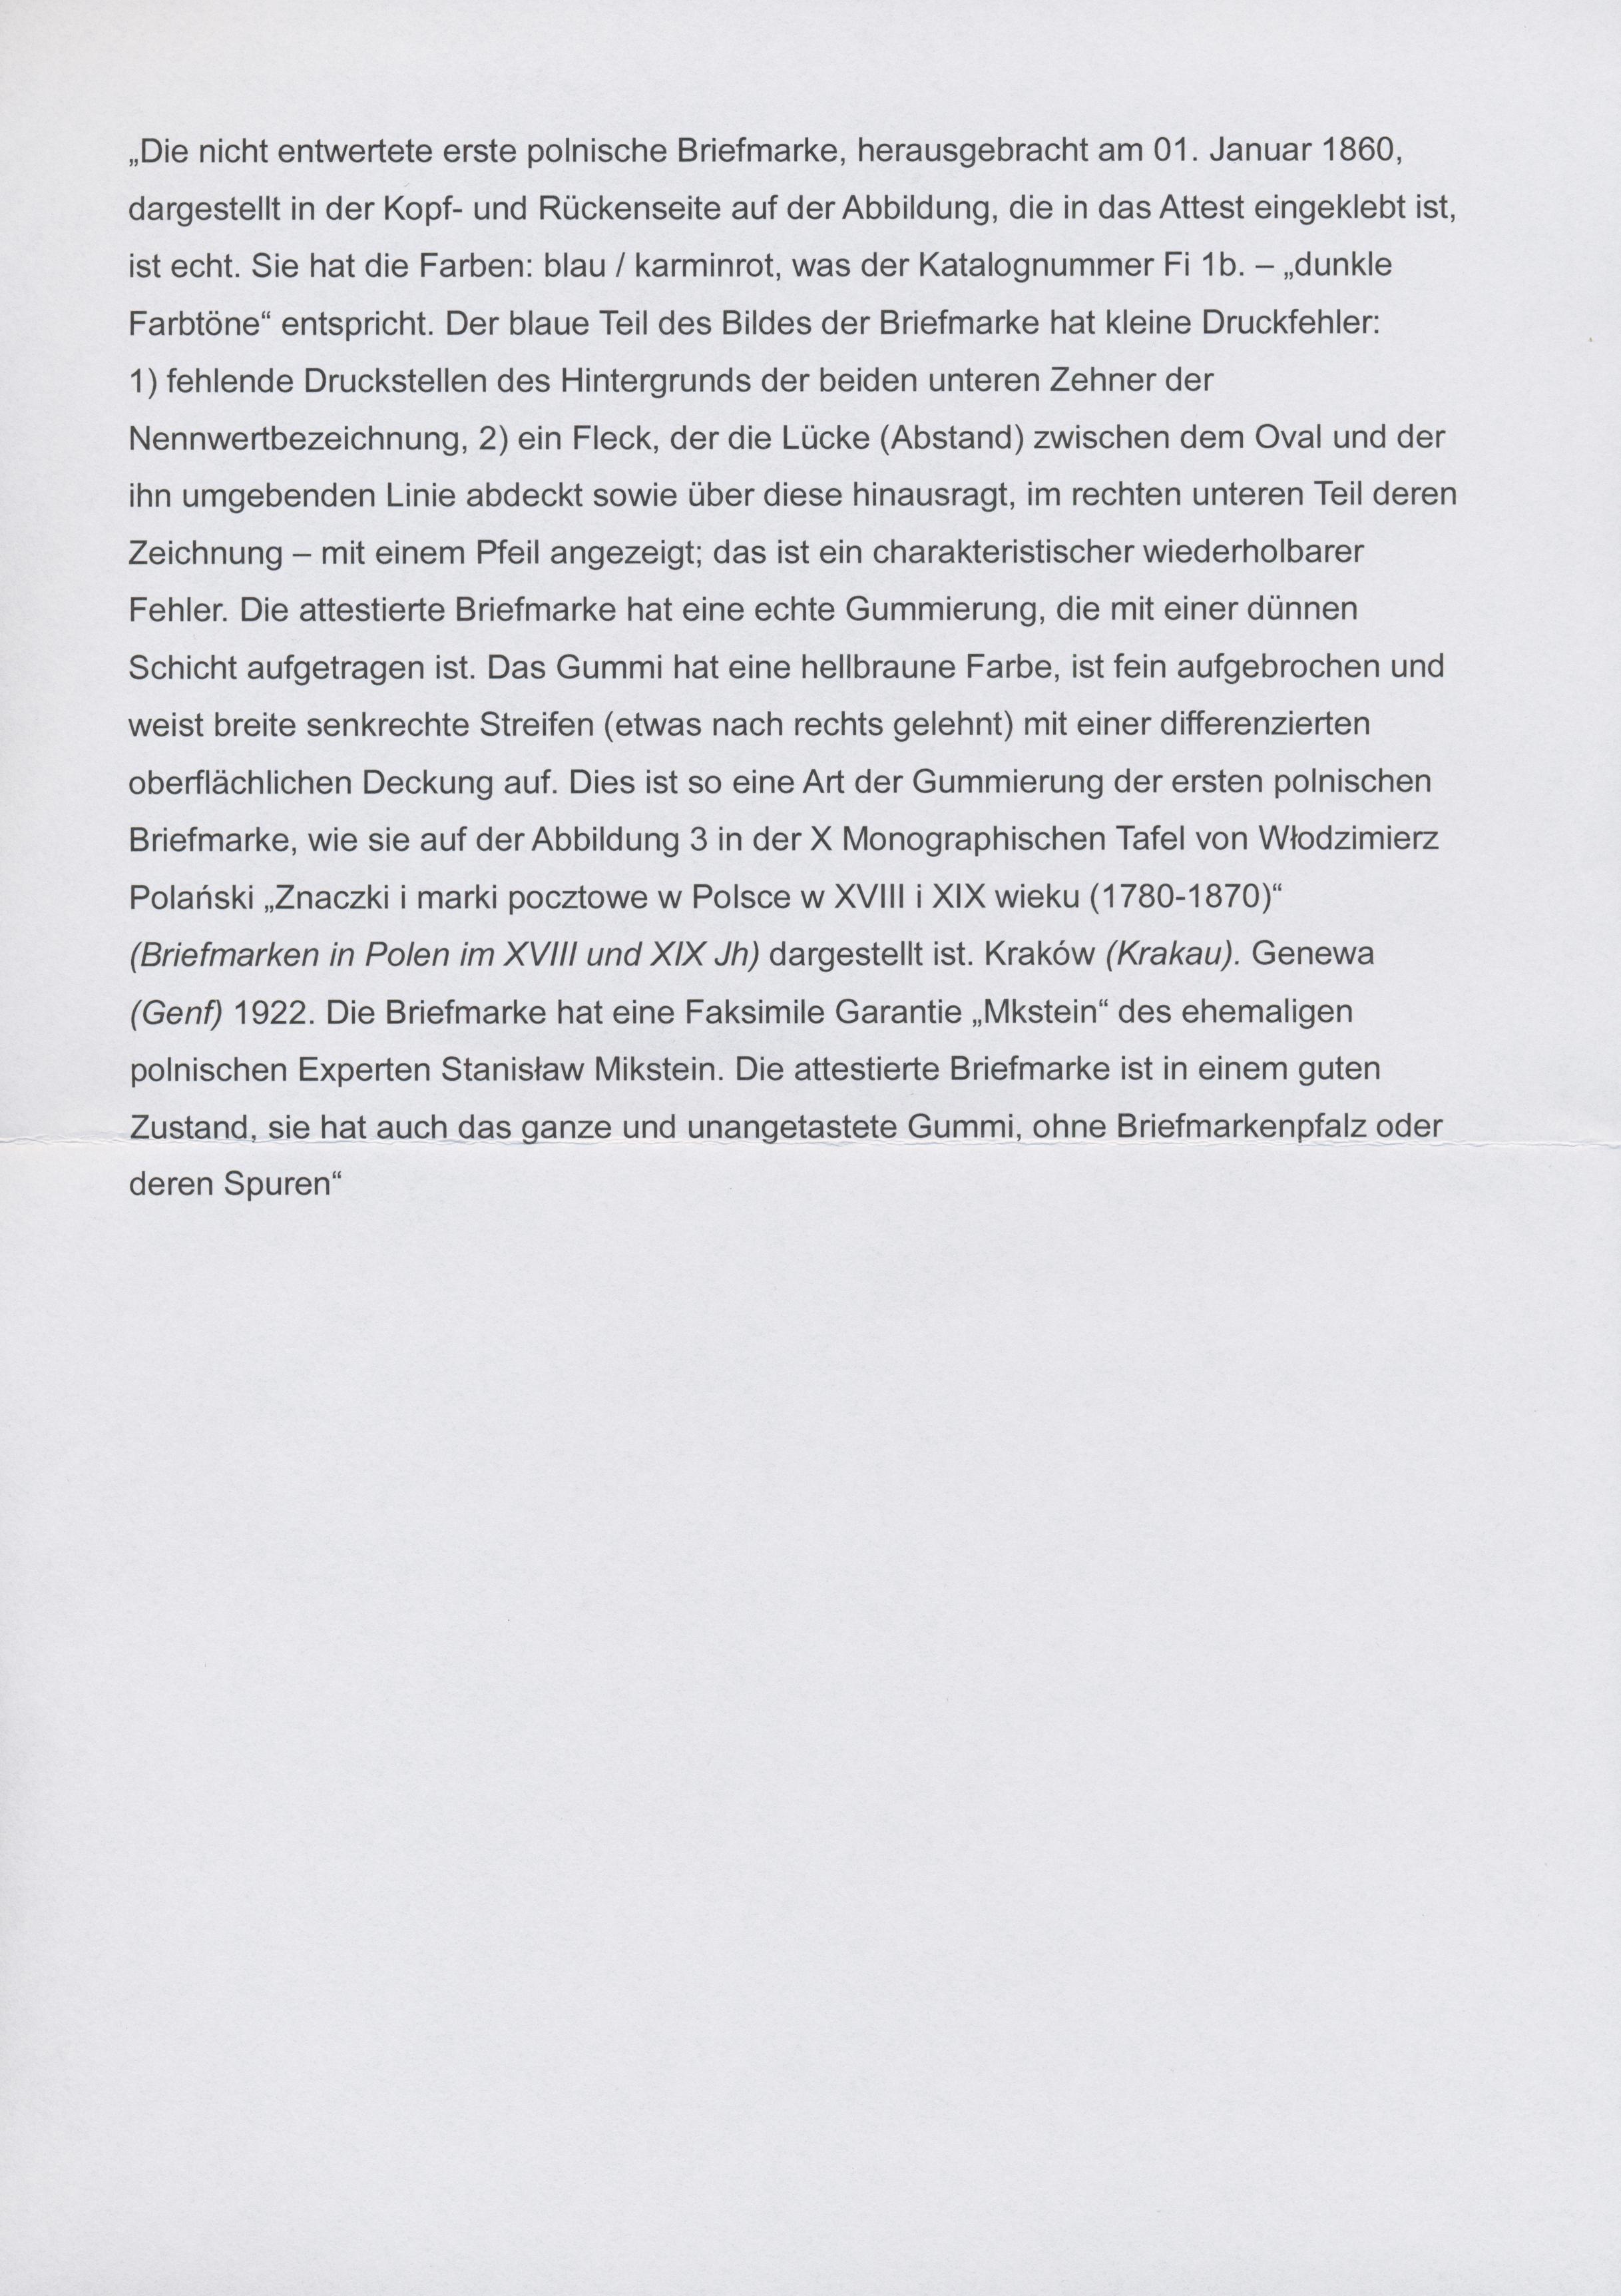 Lot 1552 - polen  -  Auktionshaus Christoph Gärtner GmbH & Co. KG Auction #41 Special auction part two